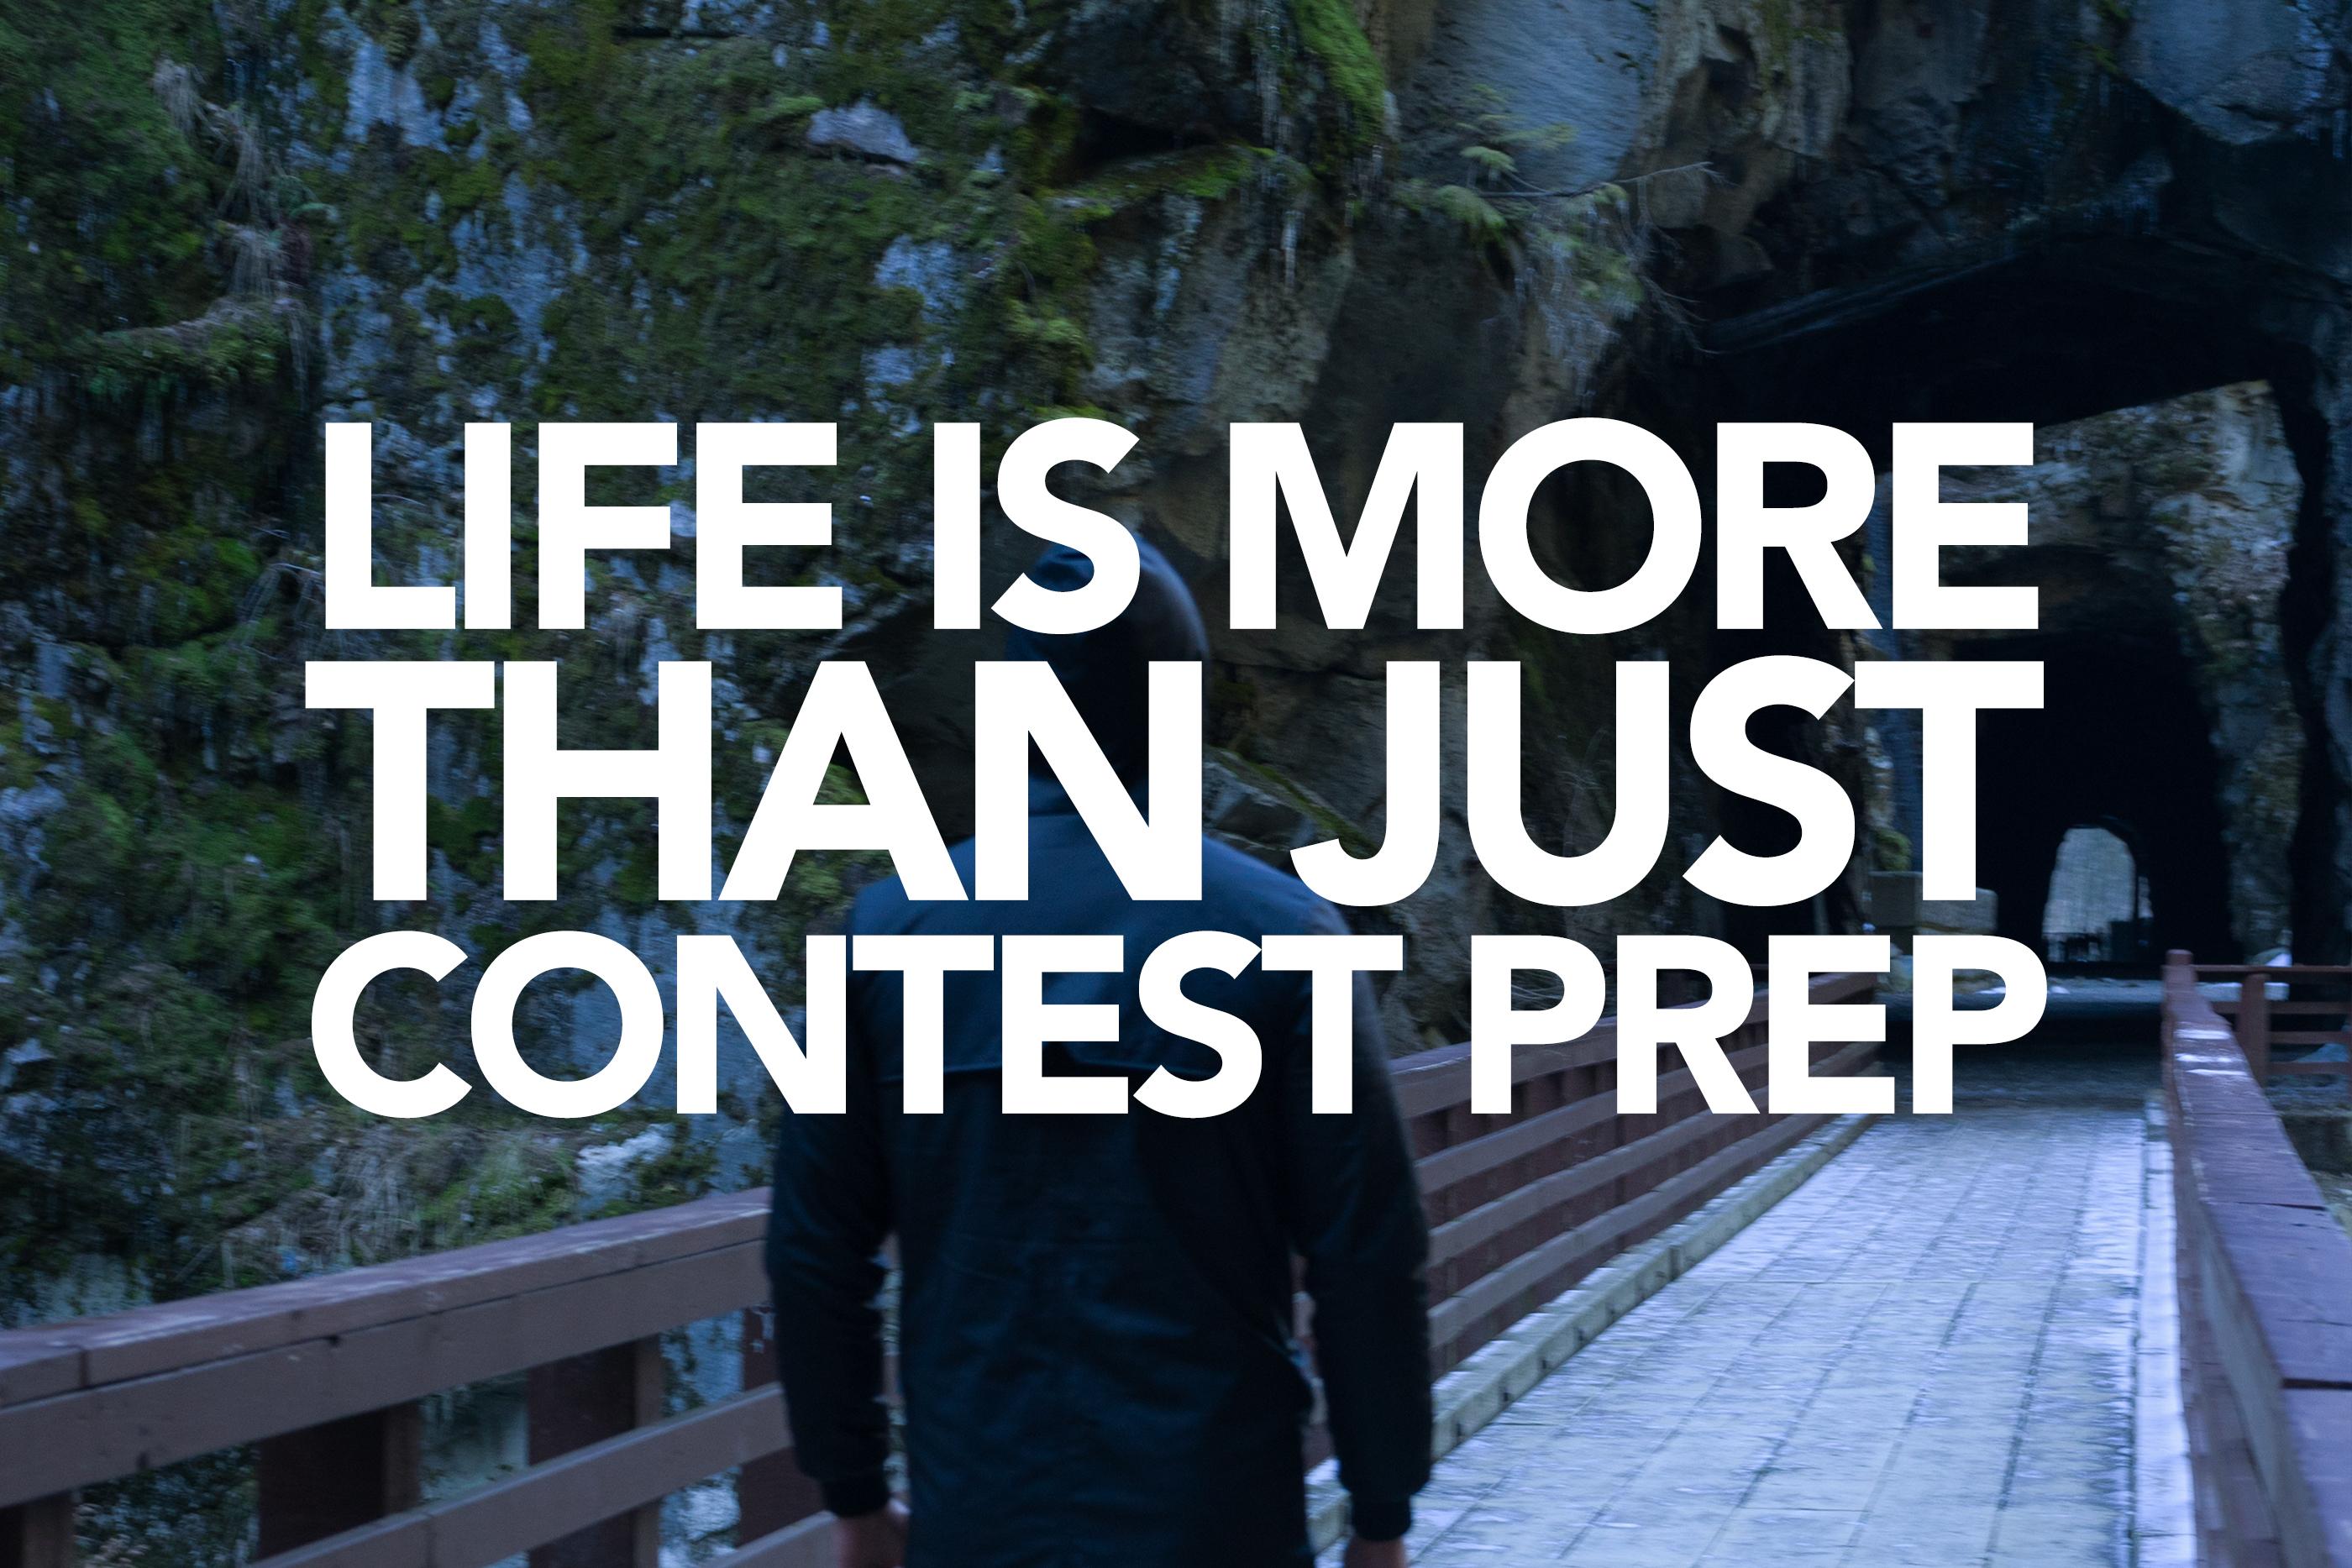 LIFE AFTER PREP